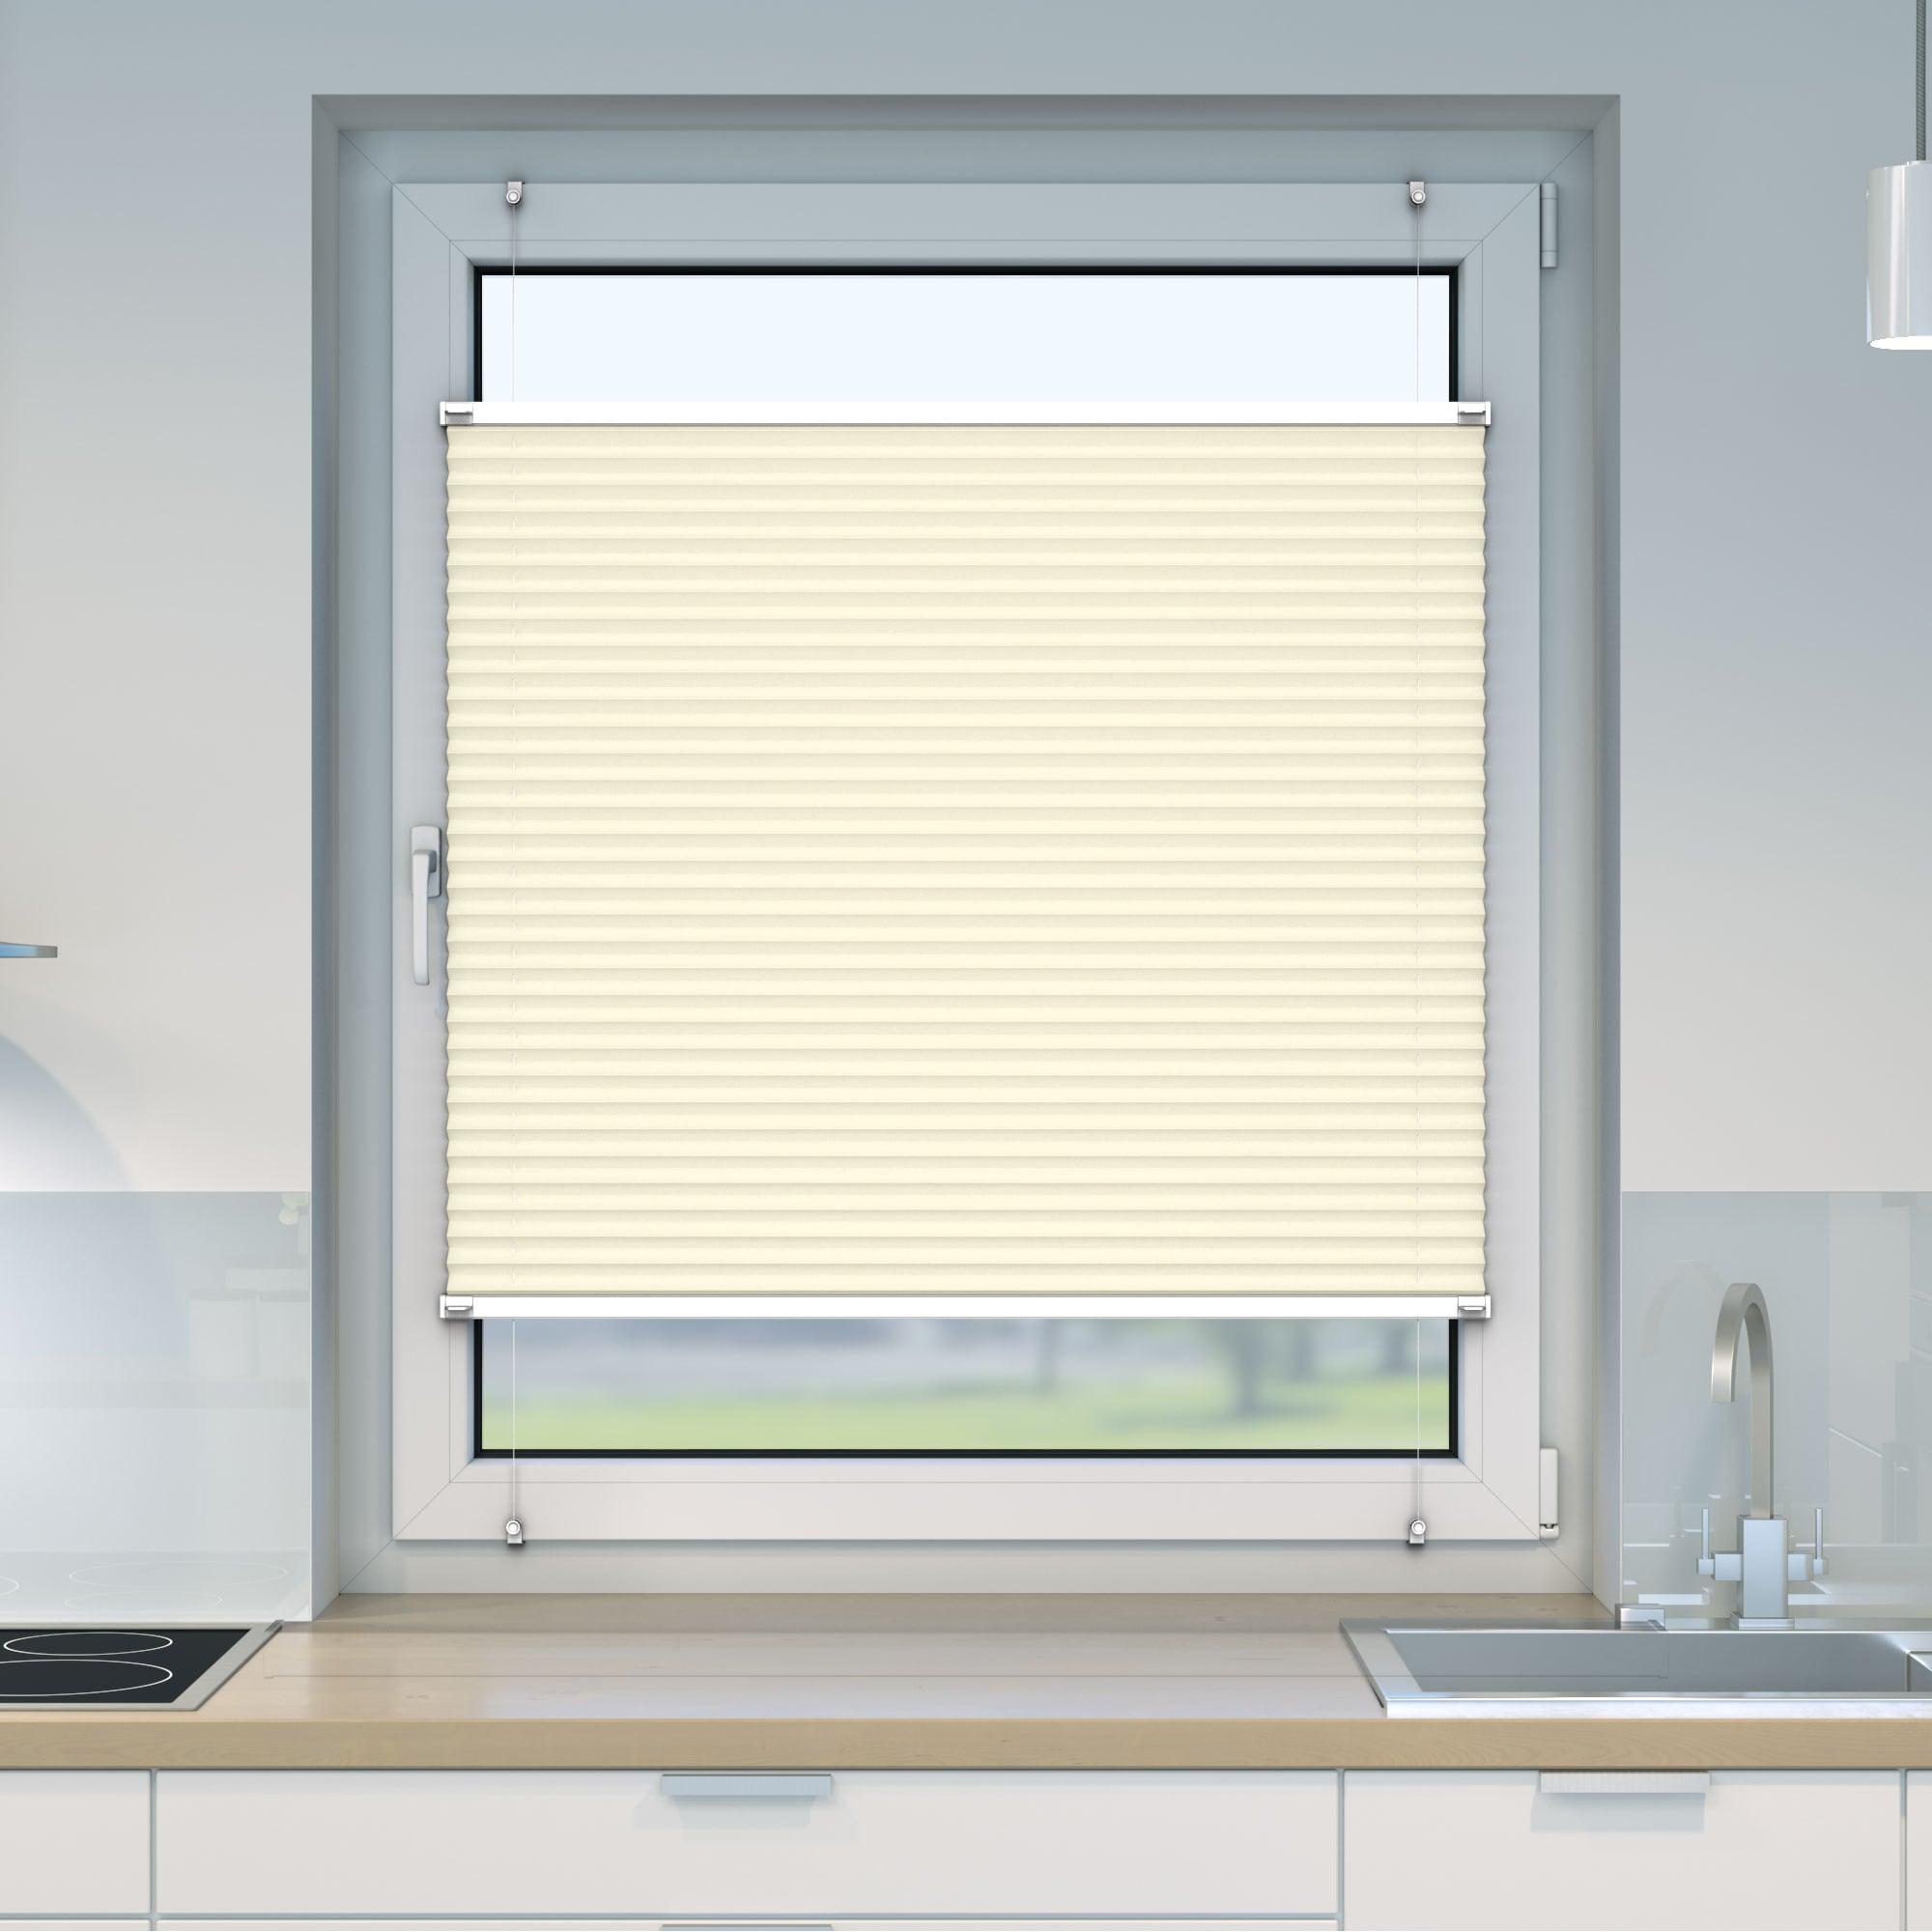 Klemmfix-Plissee-Faltrollo-ohne-Bohren-Fenster-Tuer-Plisseerollo-Plisee-Easyfix Indexbild 26